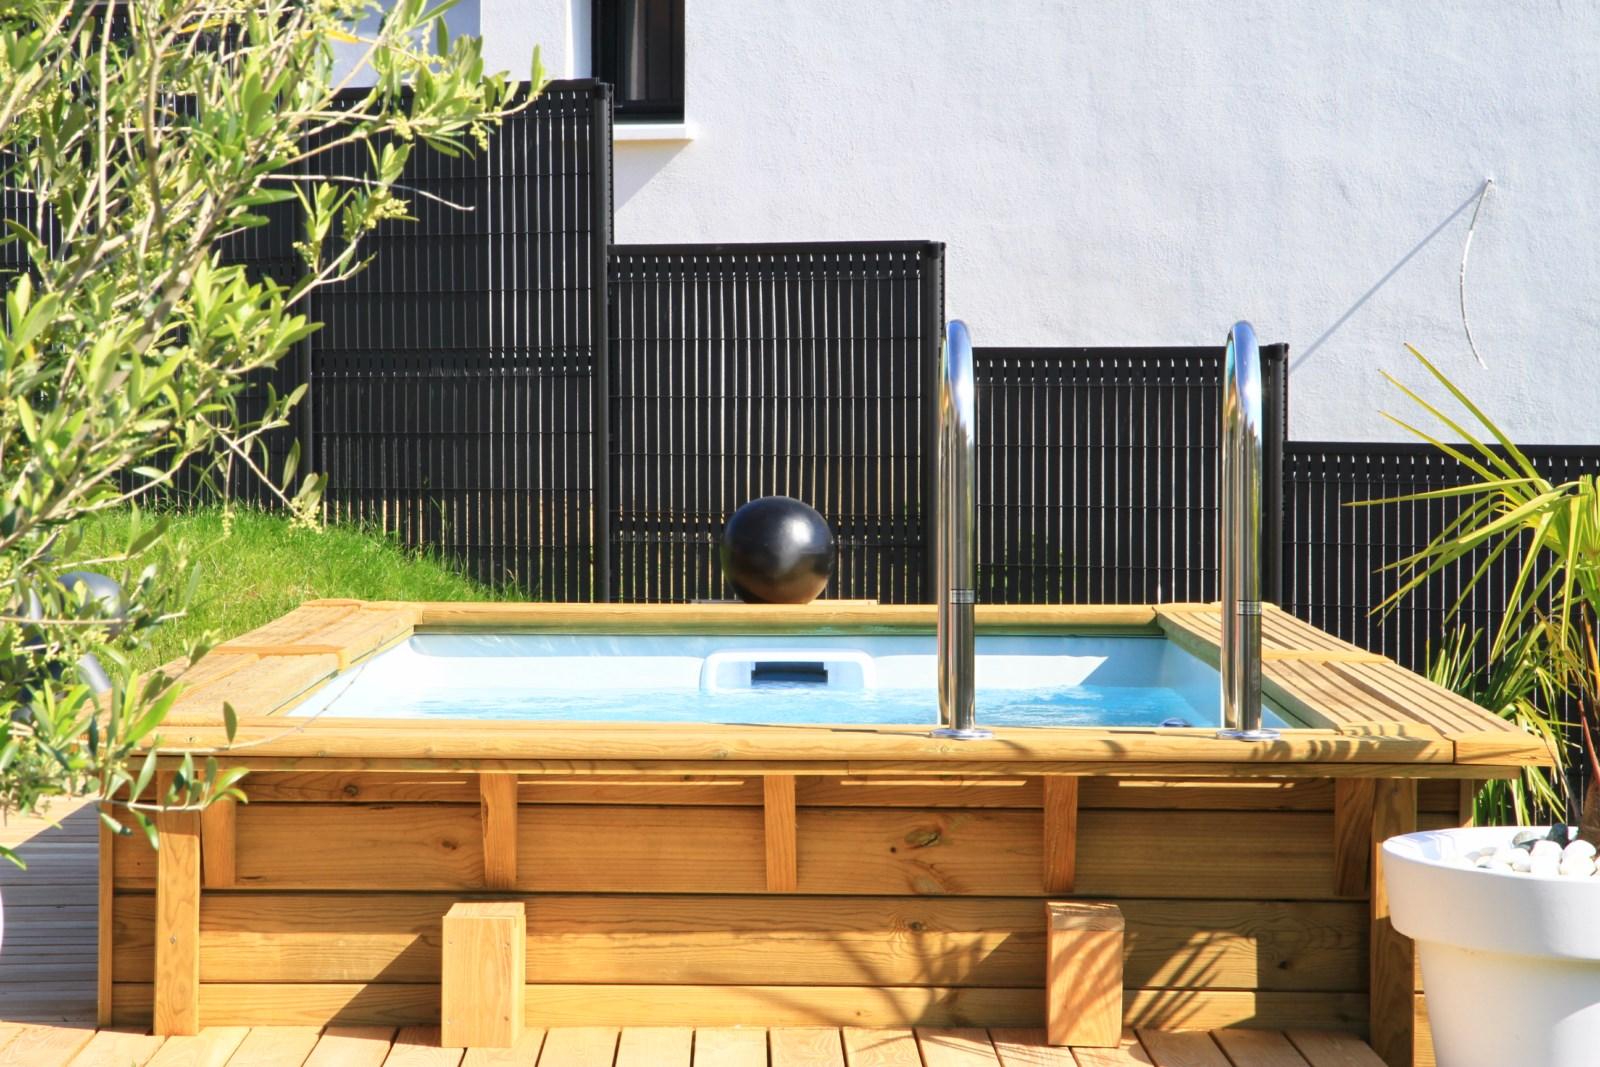 Pisciniste expert dardilly dans le rh ne paysagiste dardilly lyon les jardins de l 39 ouest - Piscine bois octogonale lyon ...